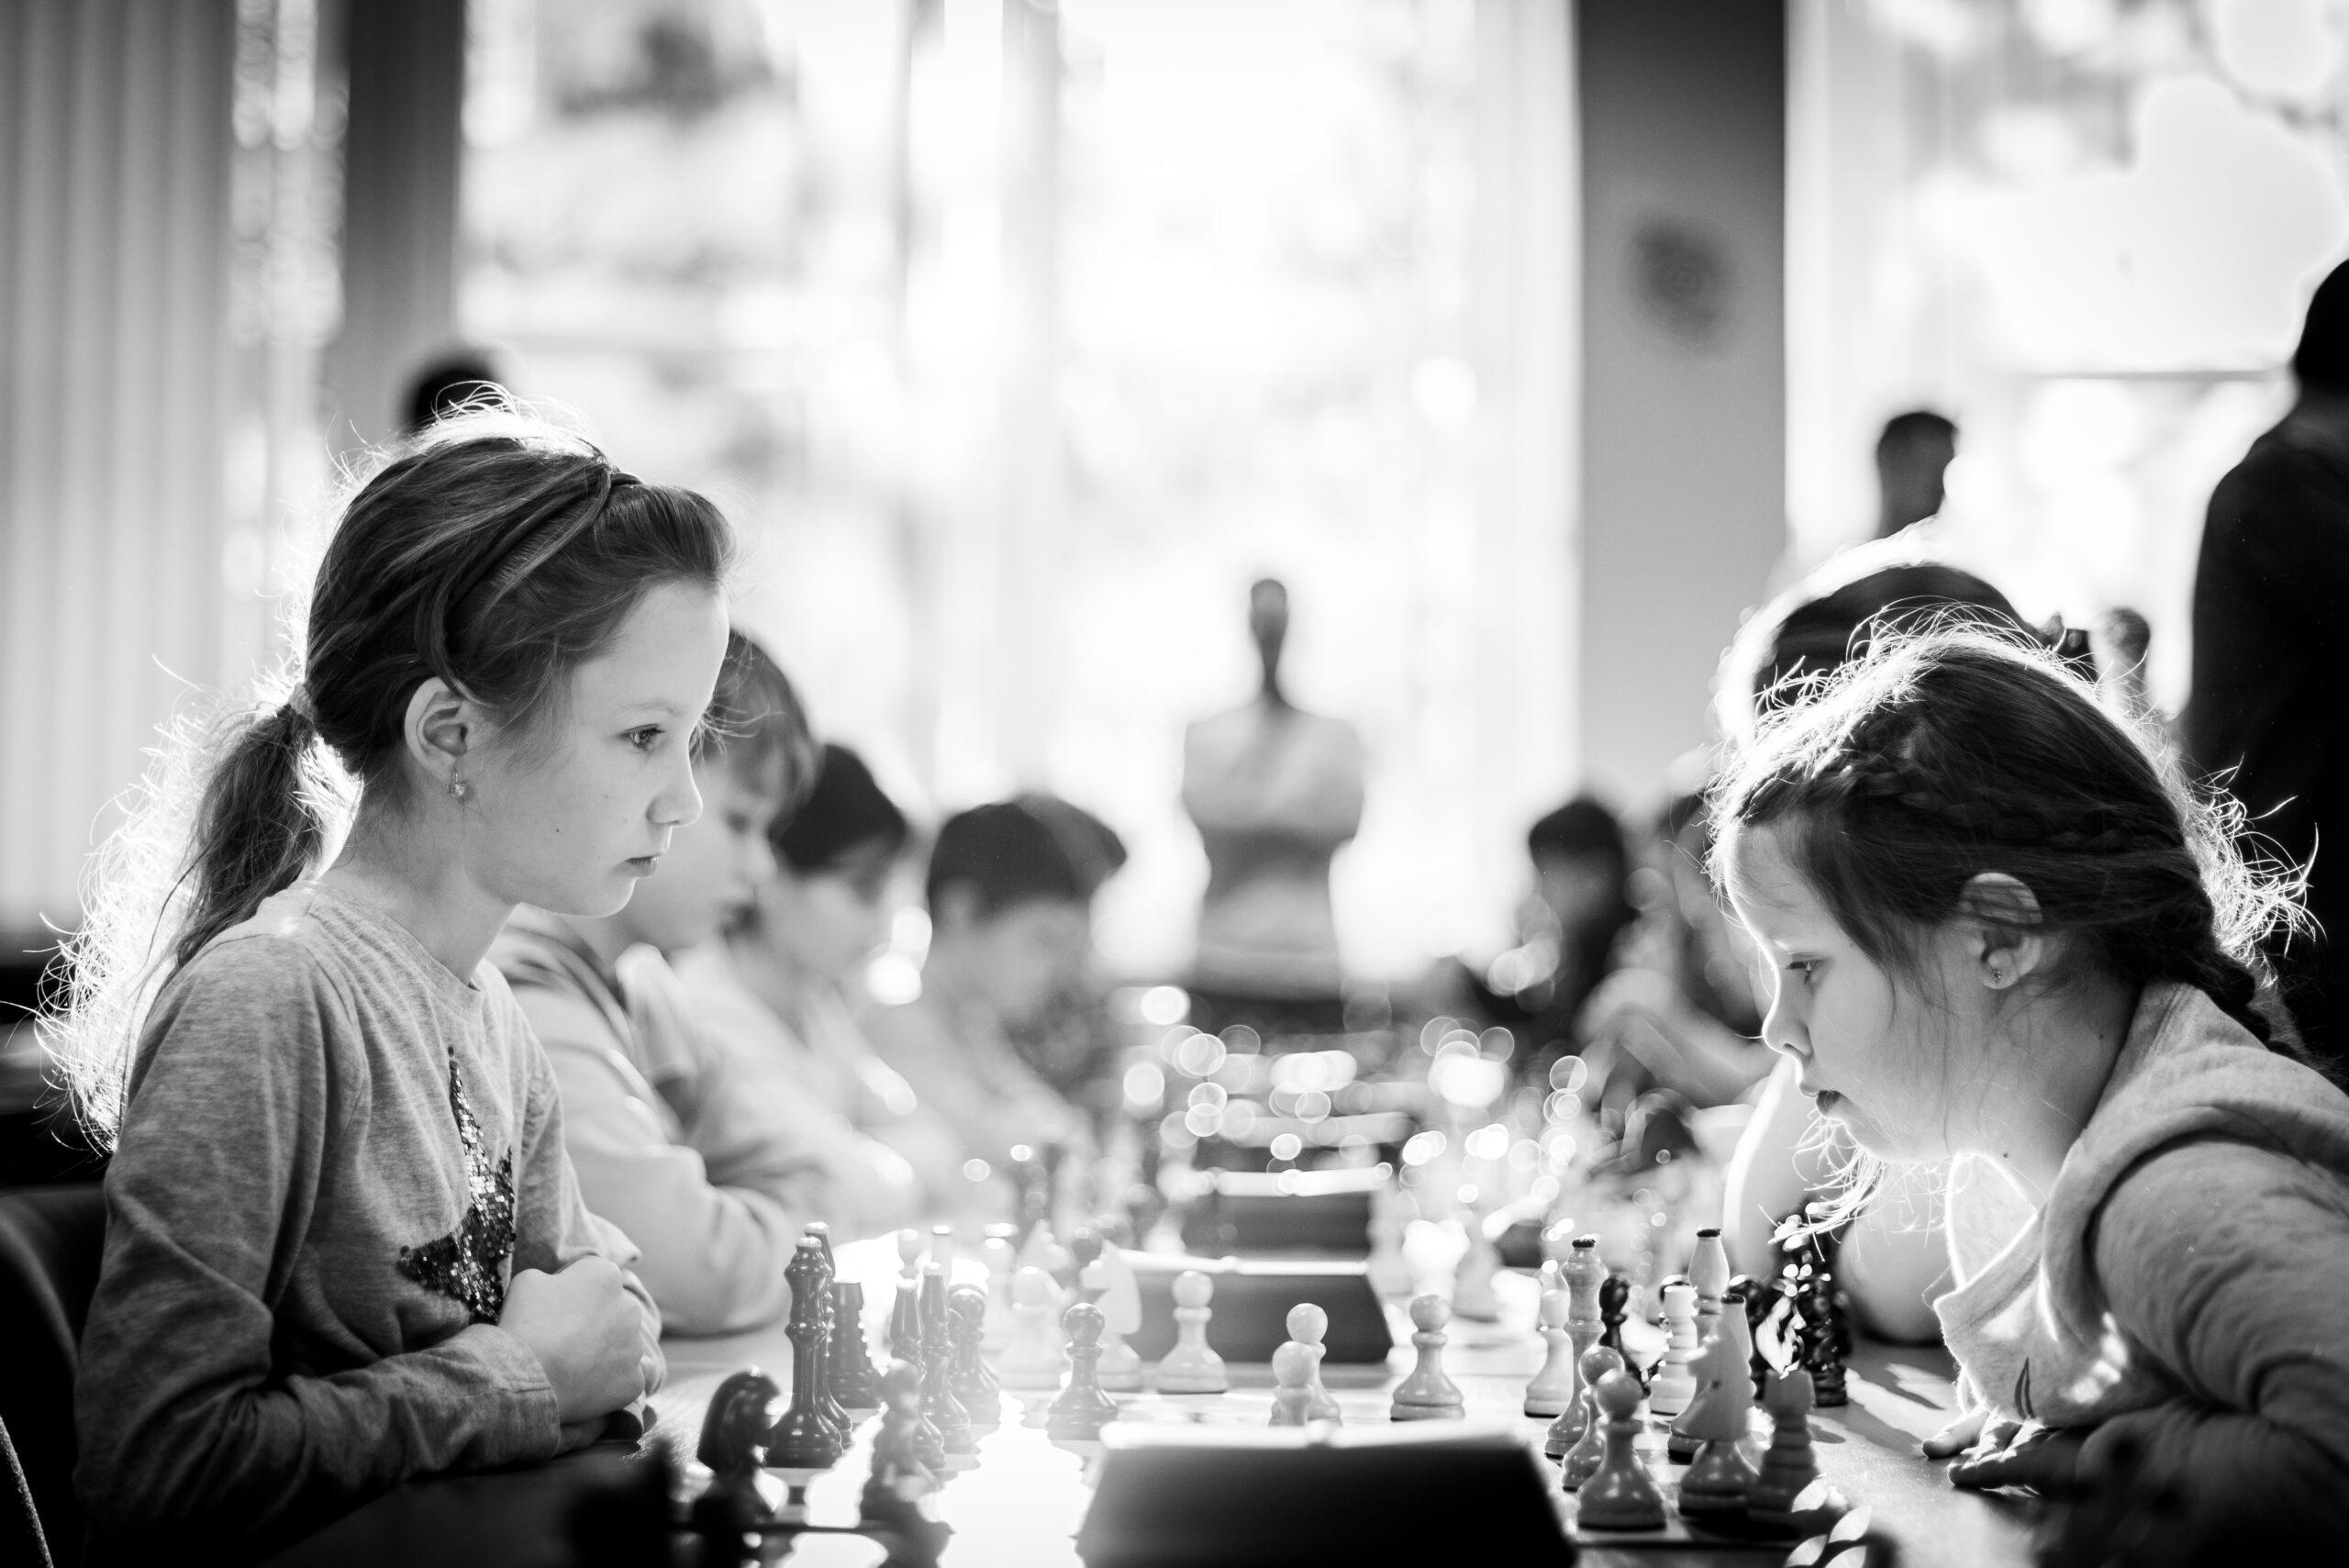 michal-vrba-Young children plaing chess in tournament-unsplash